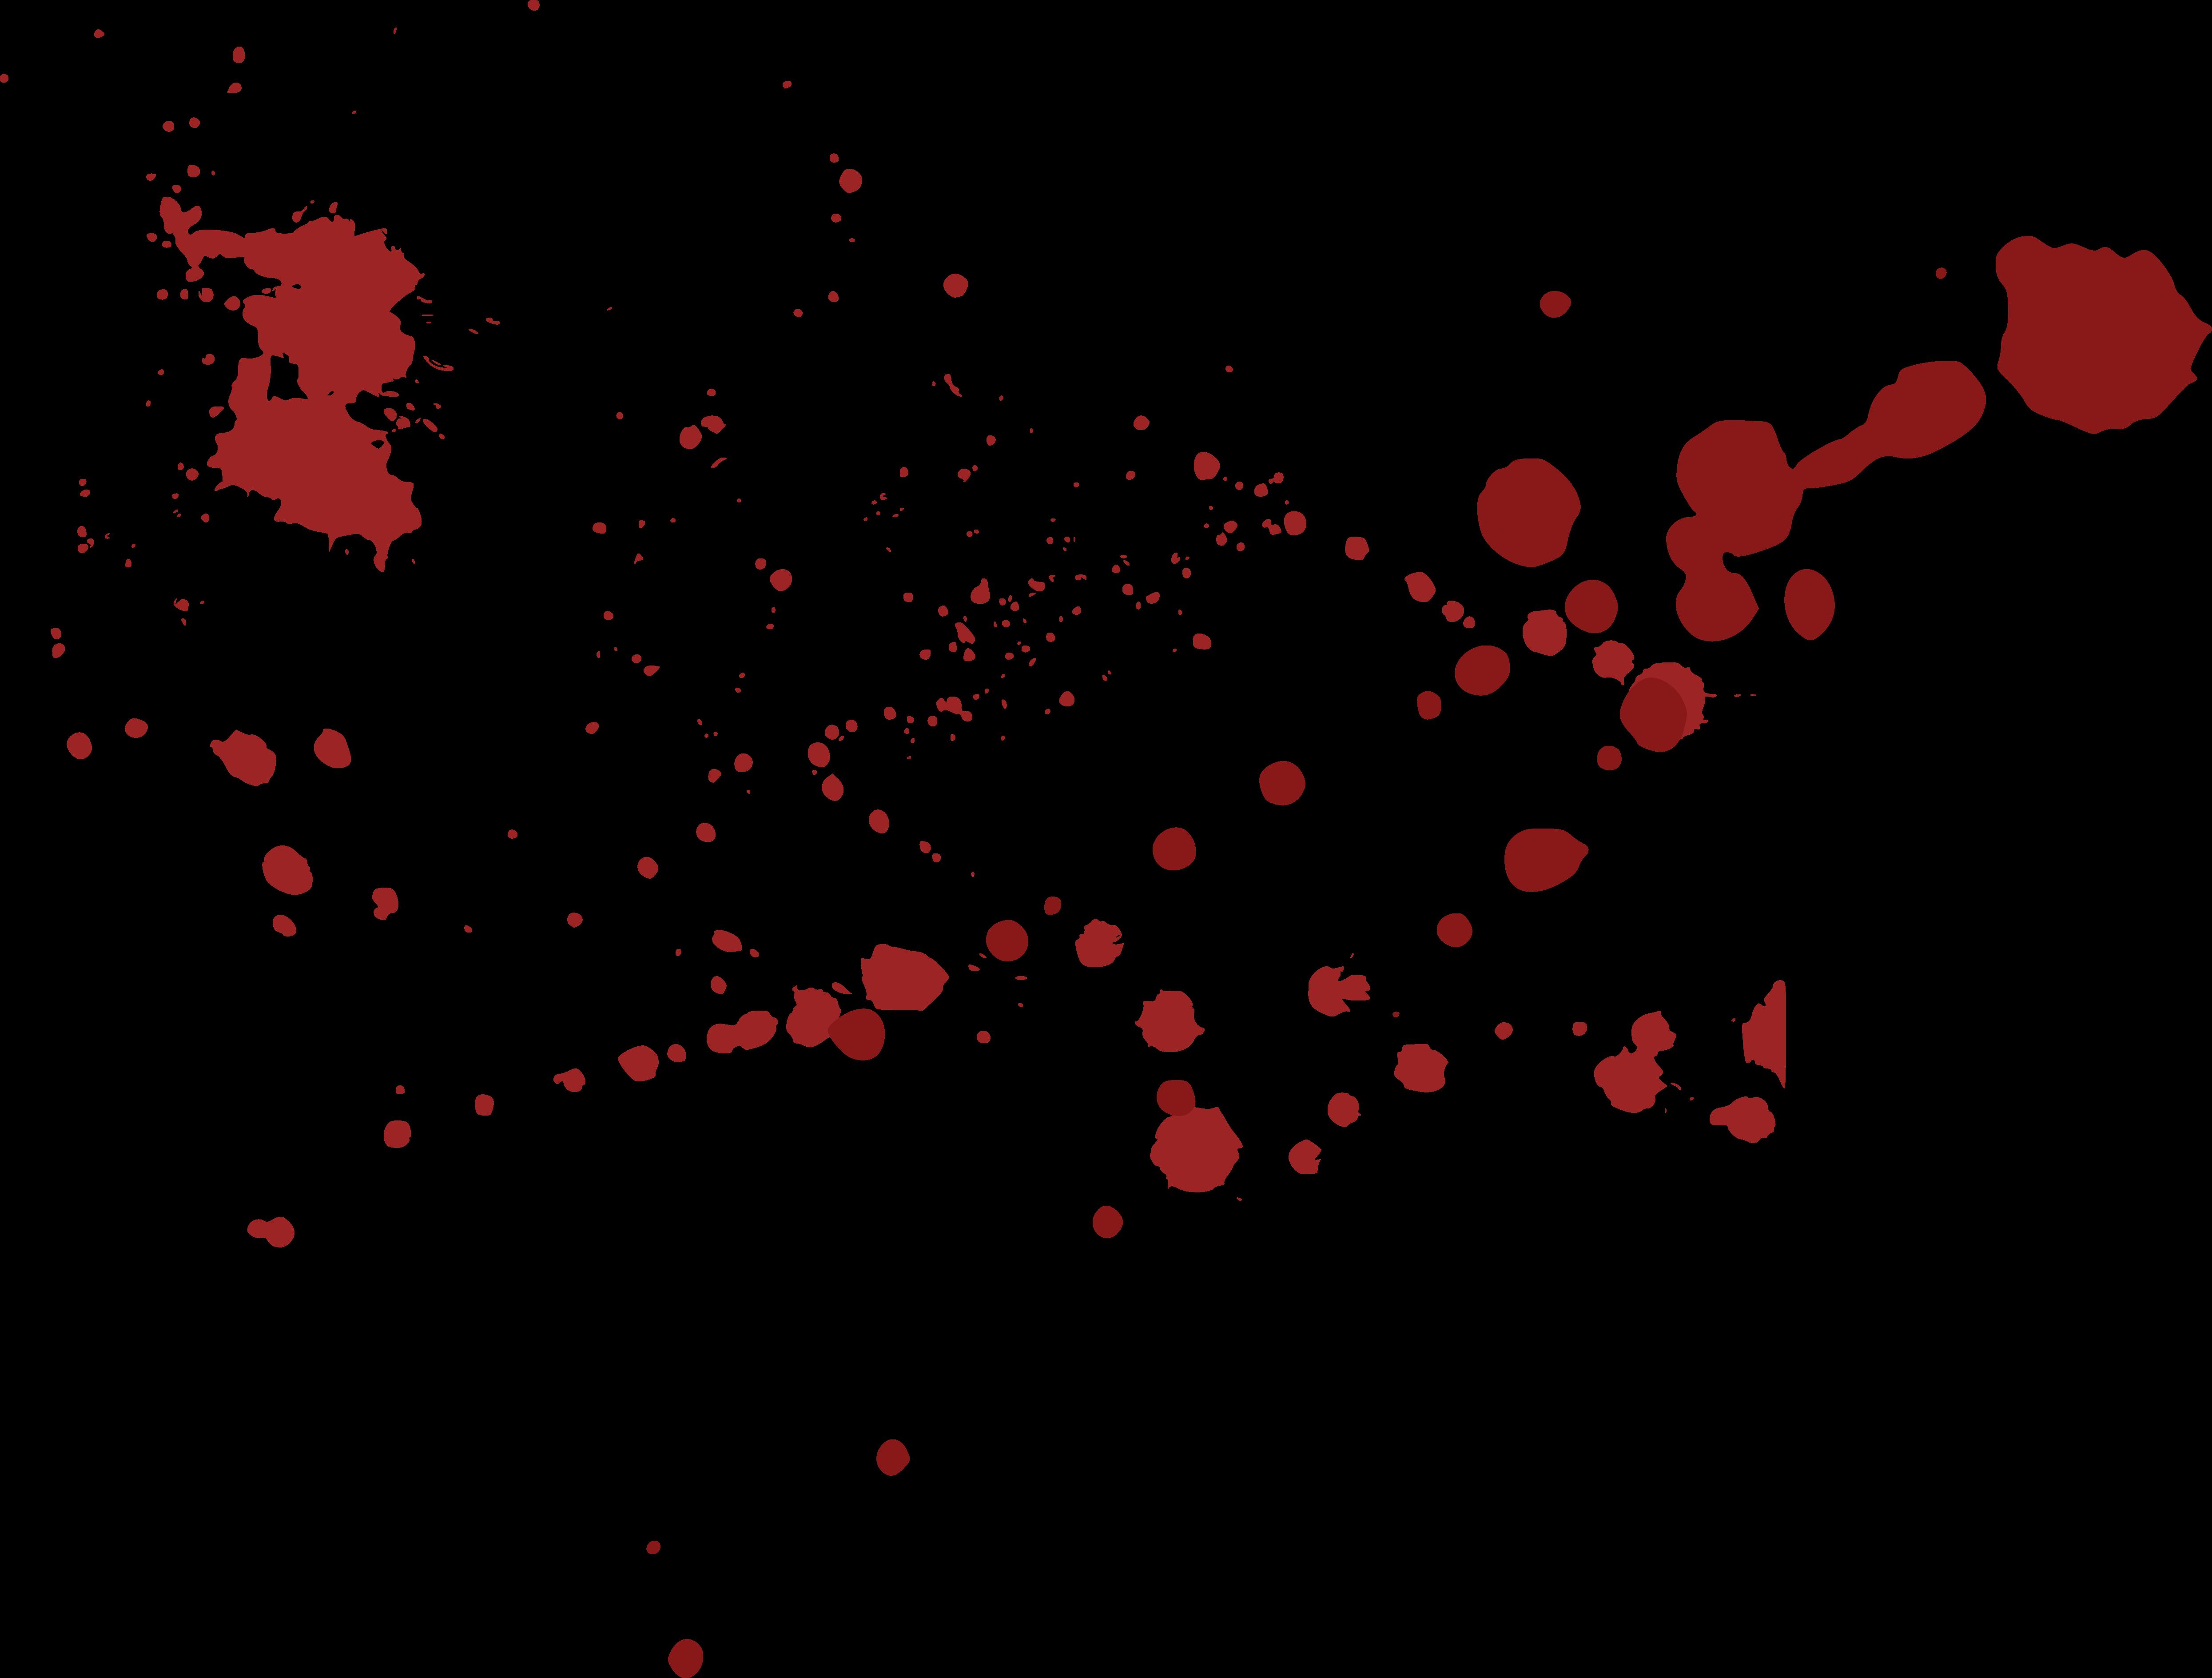 Blood Vector Png at GetDrawings.com.